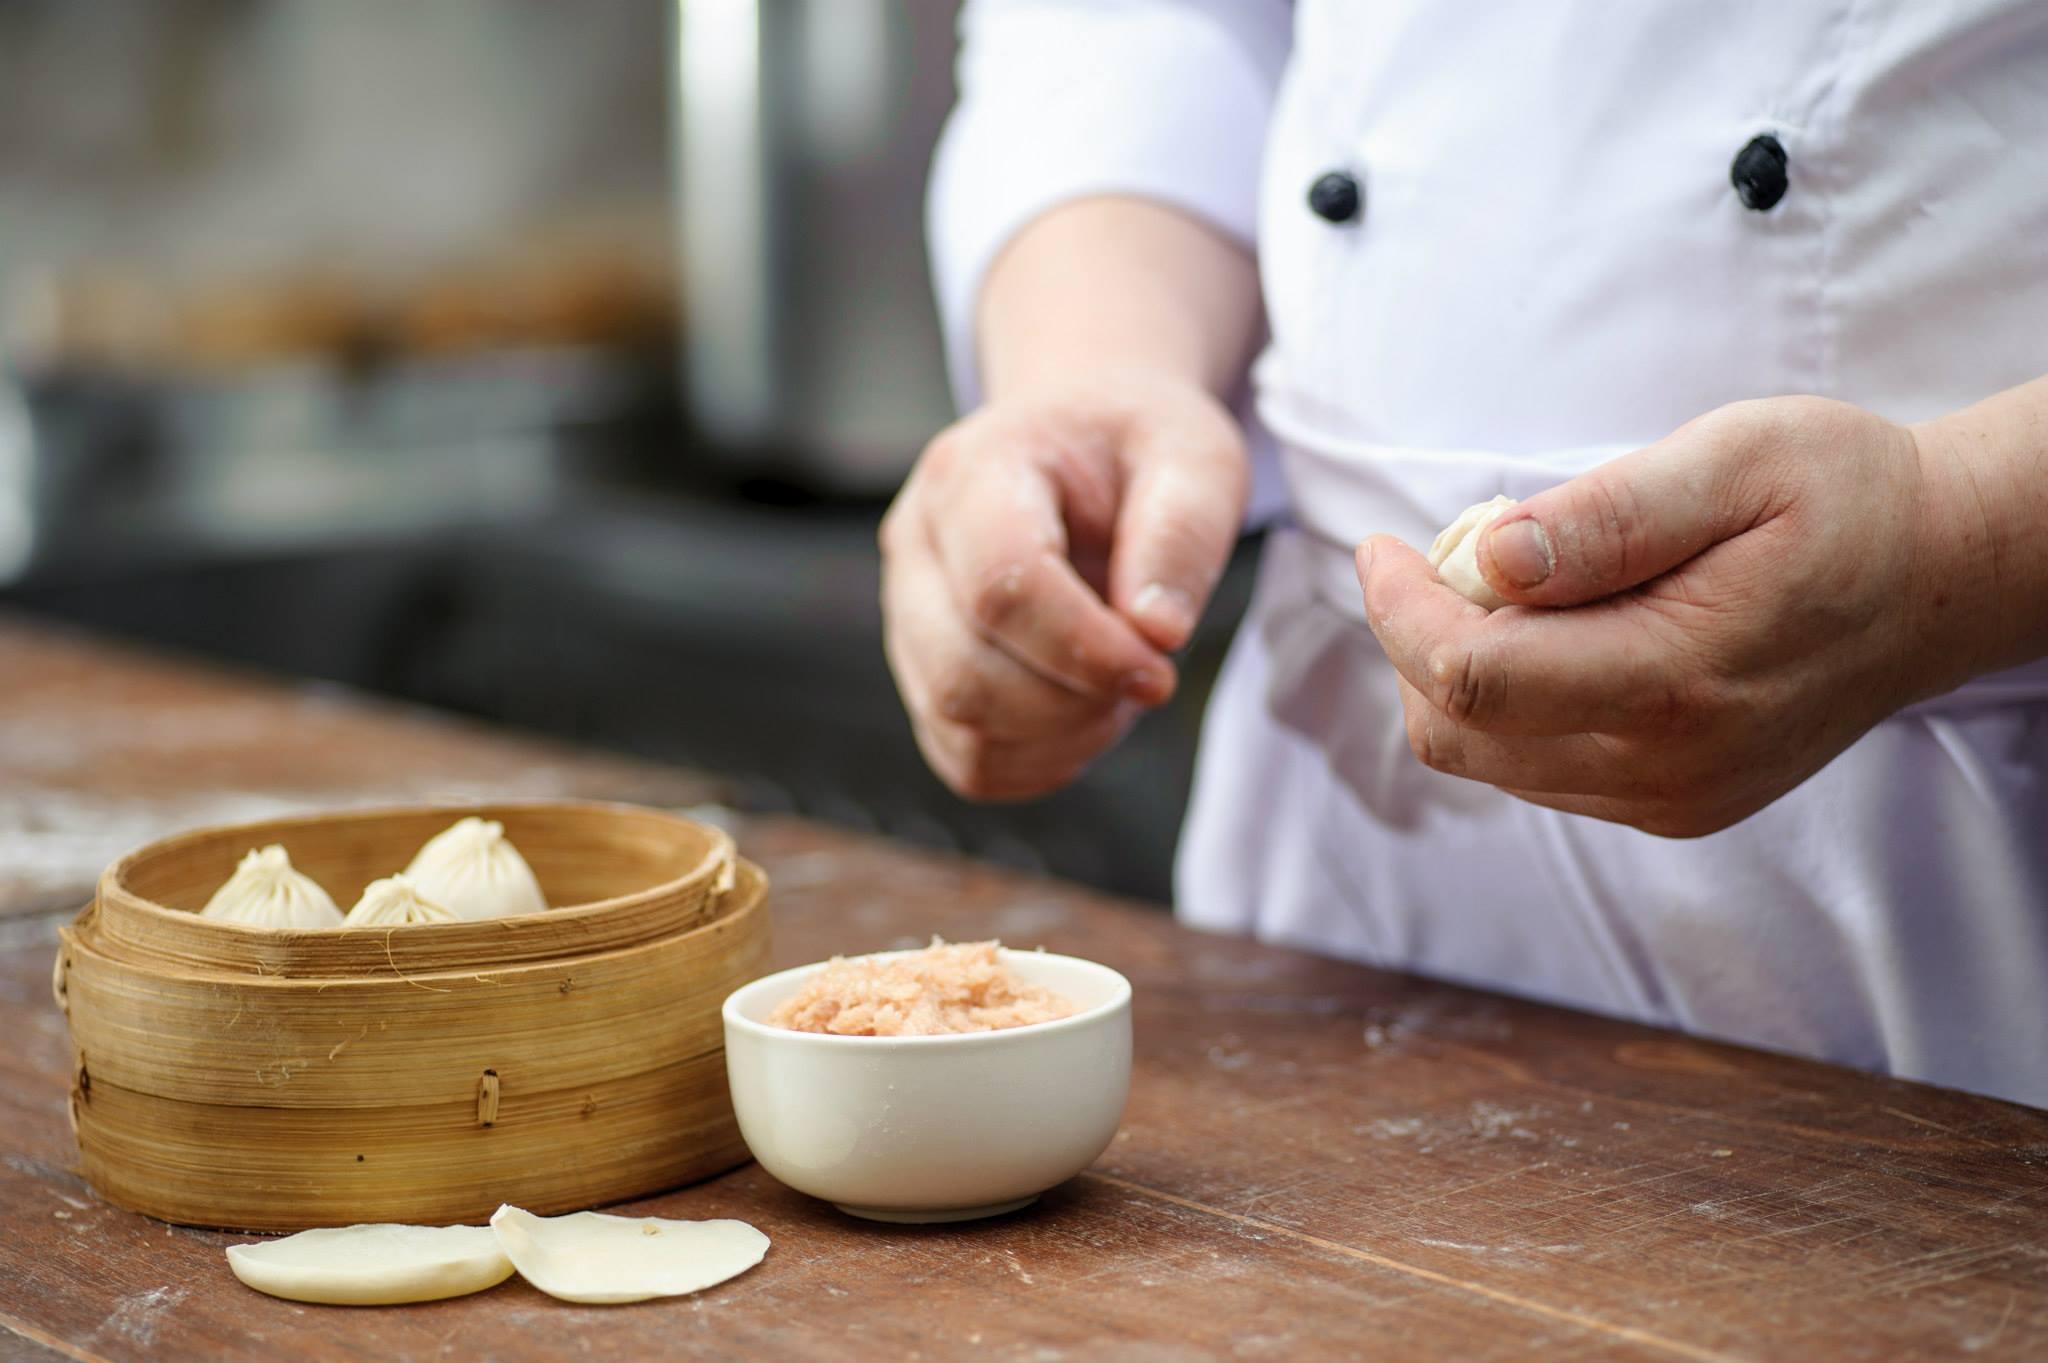 chef sealing bao.jpg